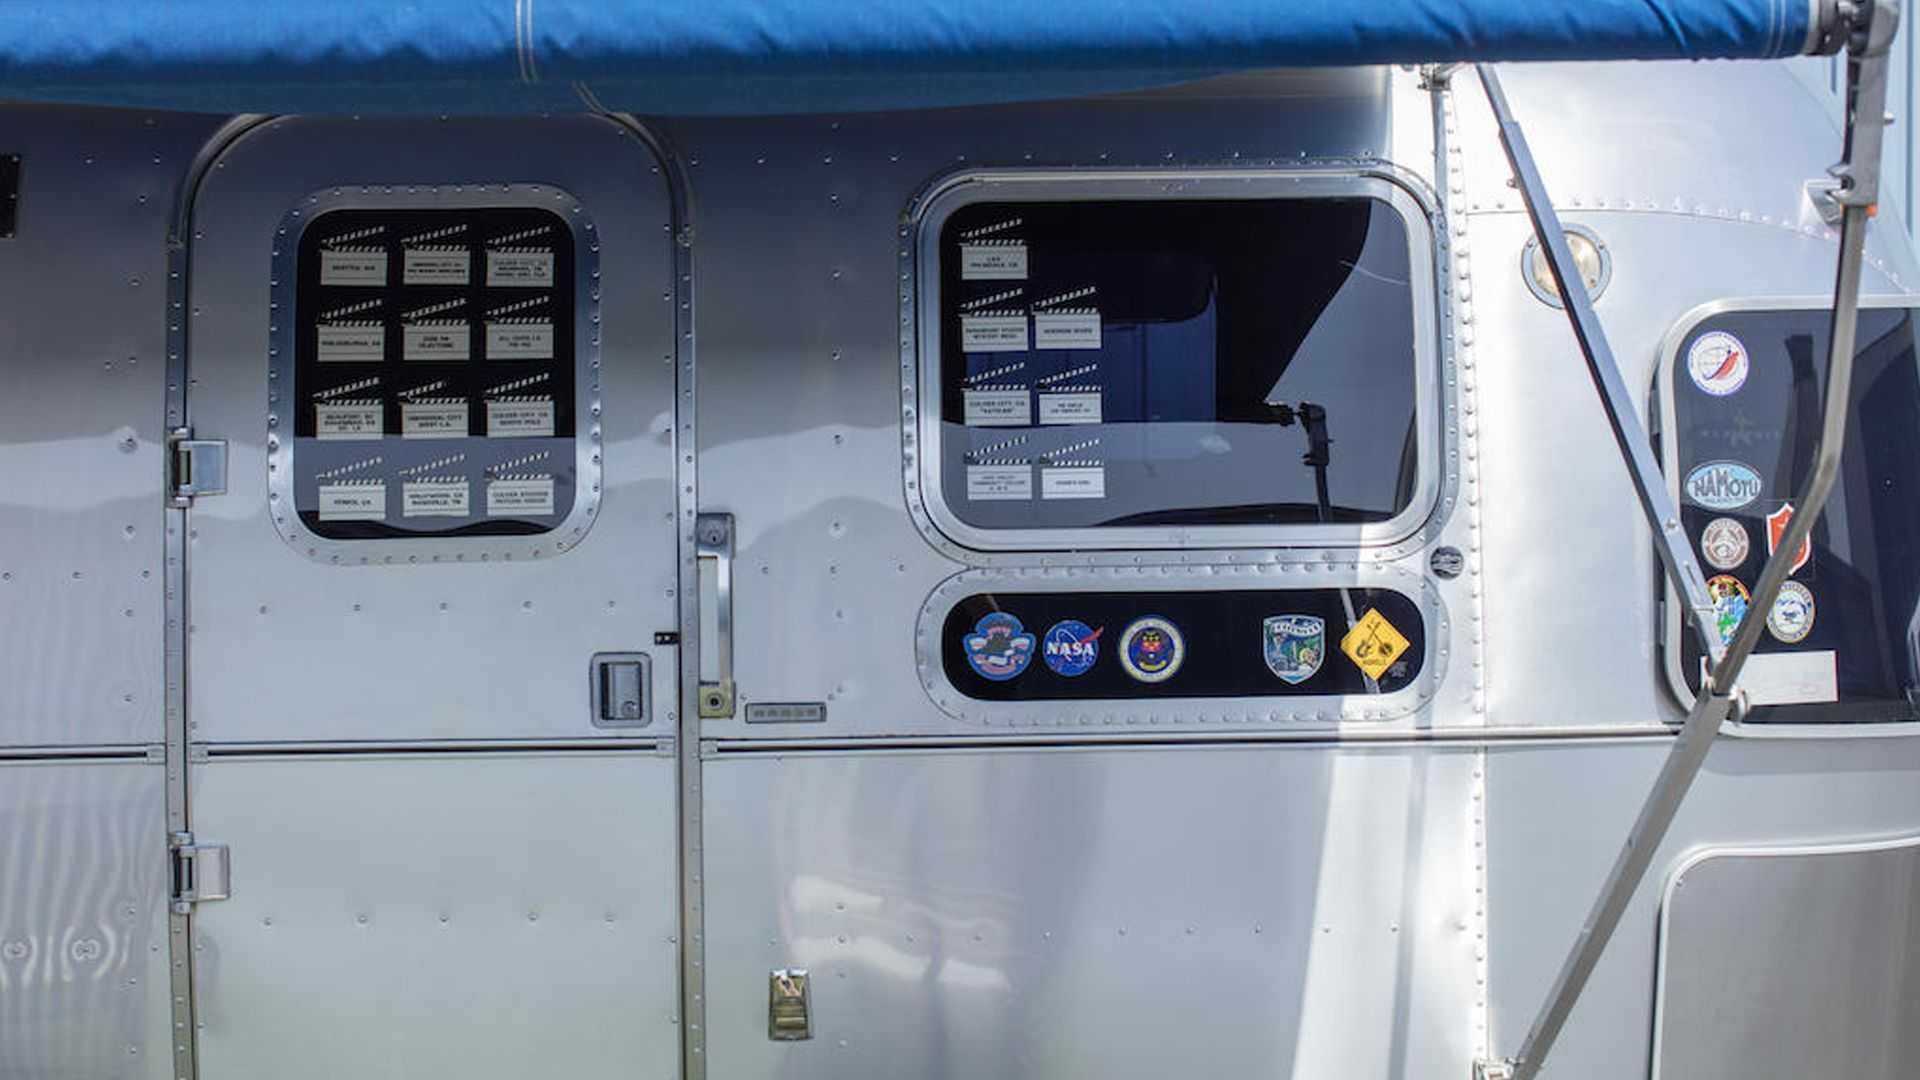 Tom-Hanks-Airstream-trailer-for-sale-9